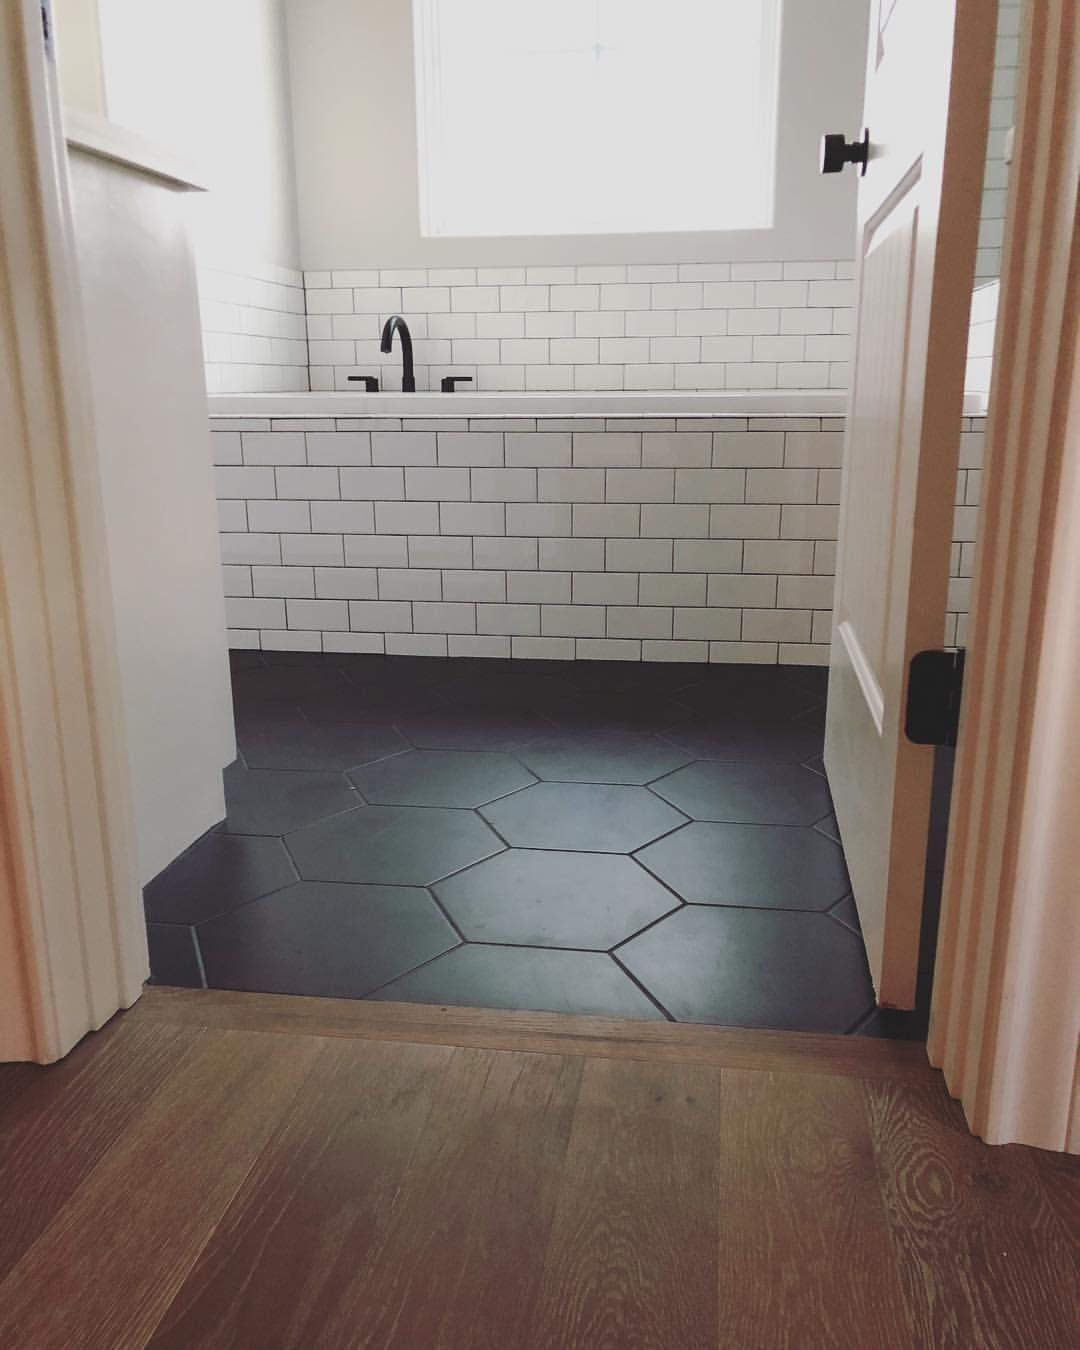 Marvelous Master Bathroom Ideas For Home20